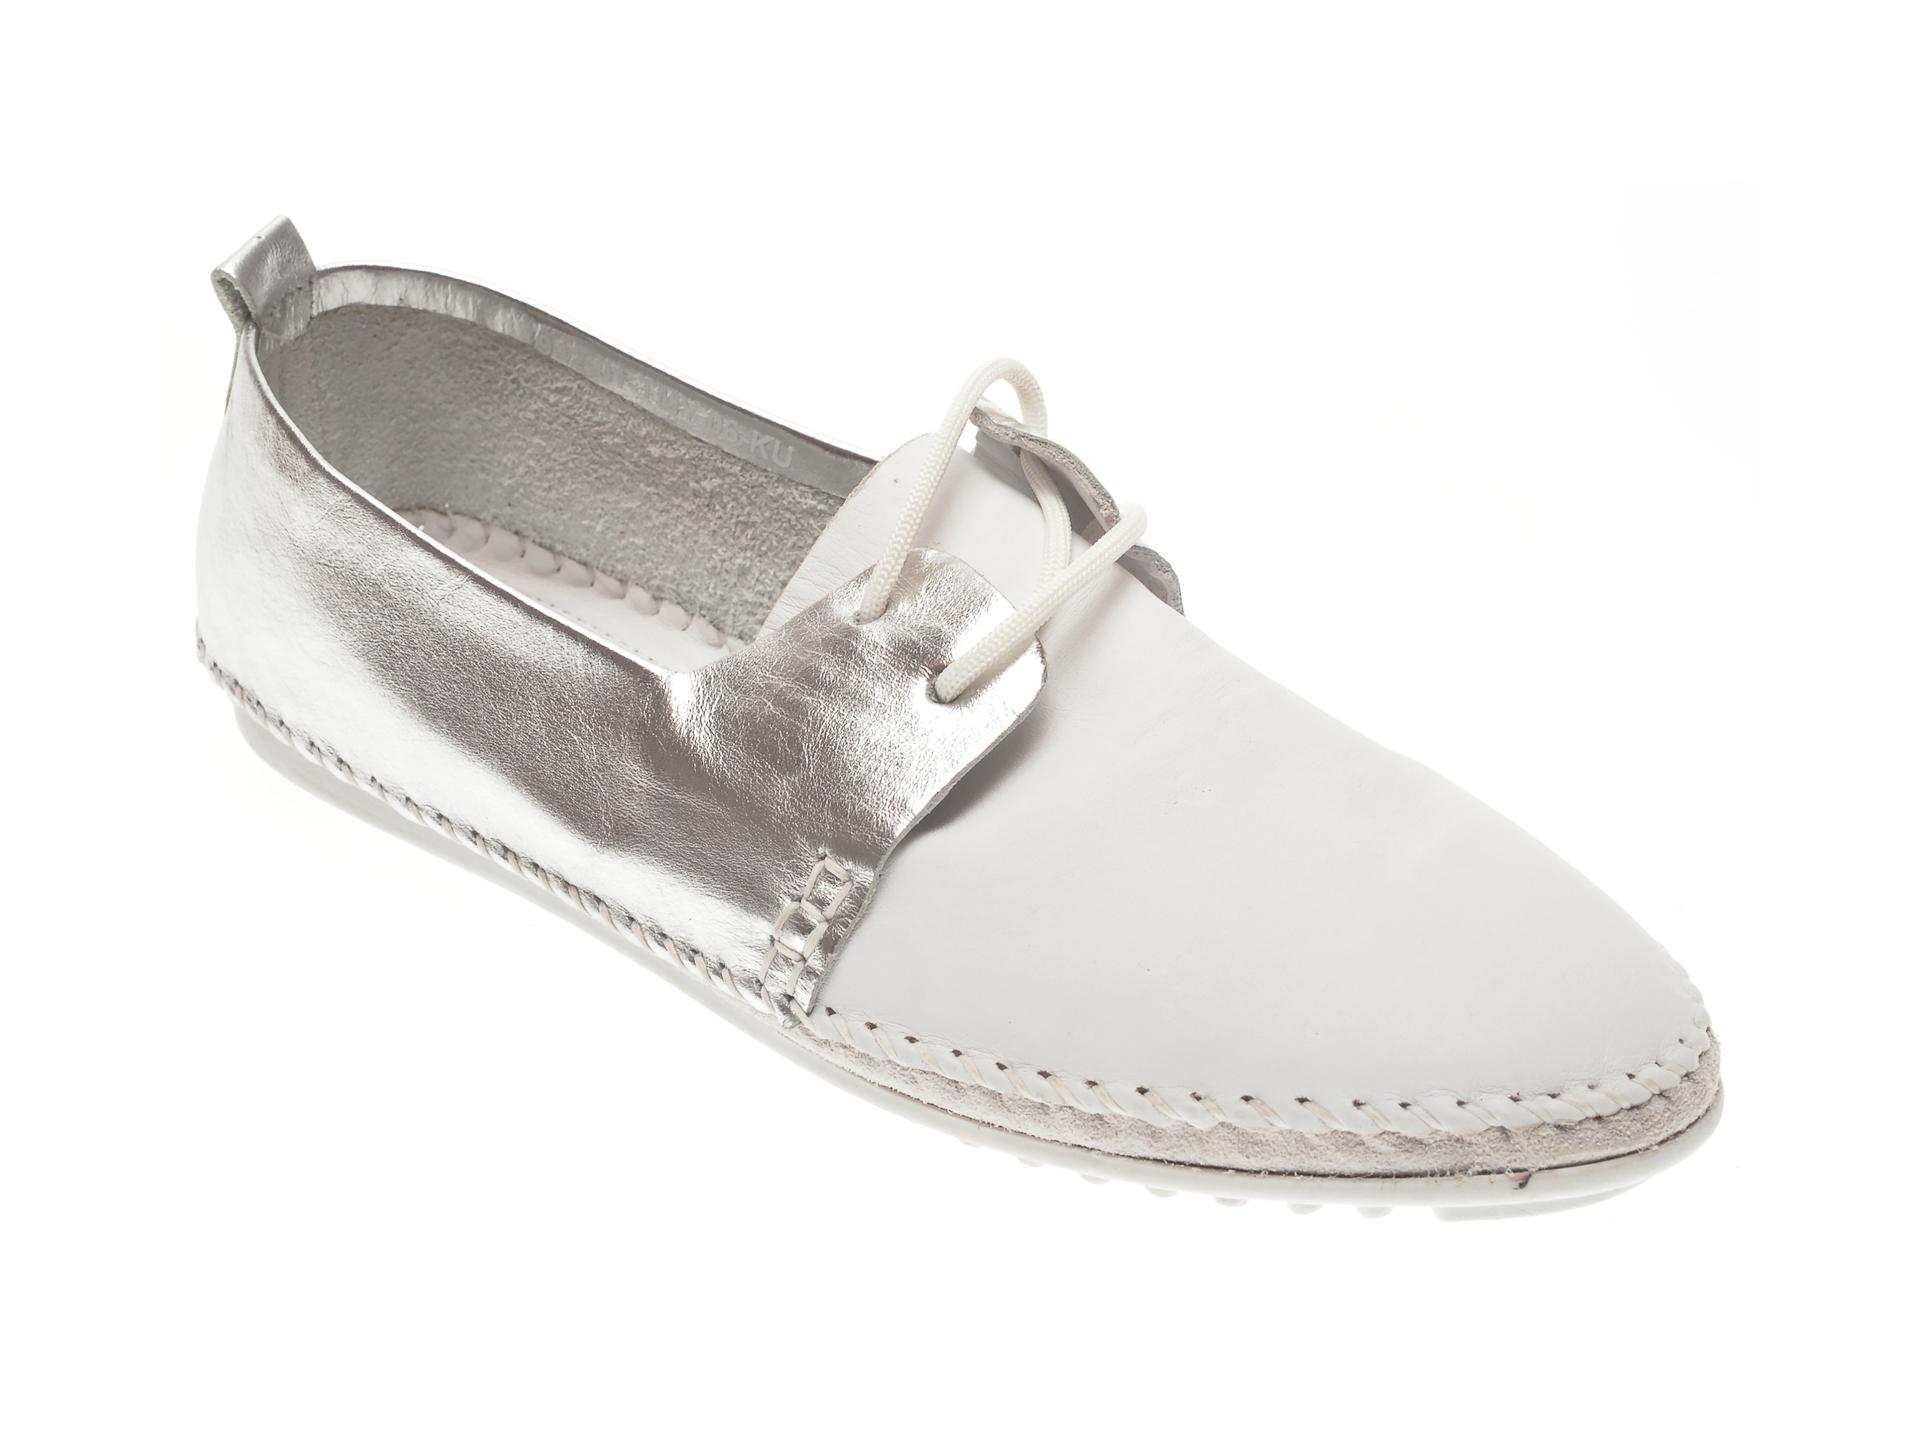 Pantofi CALIPSO albi, 102, din piele naturala